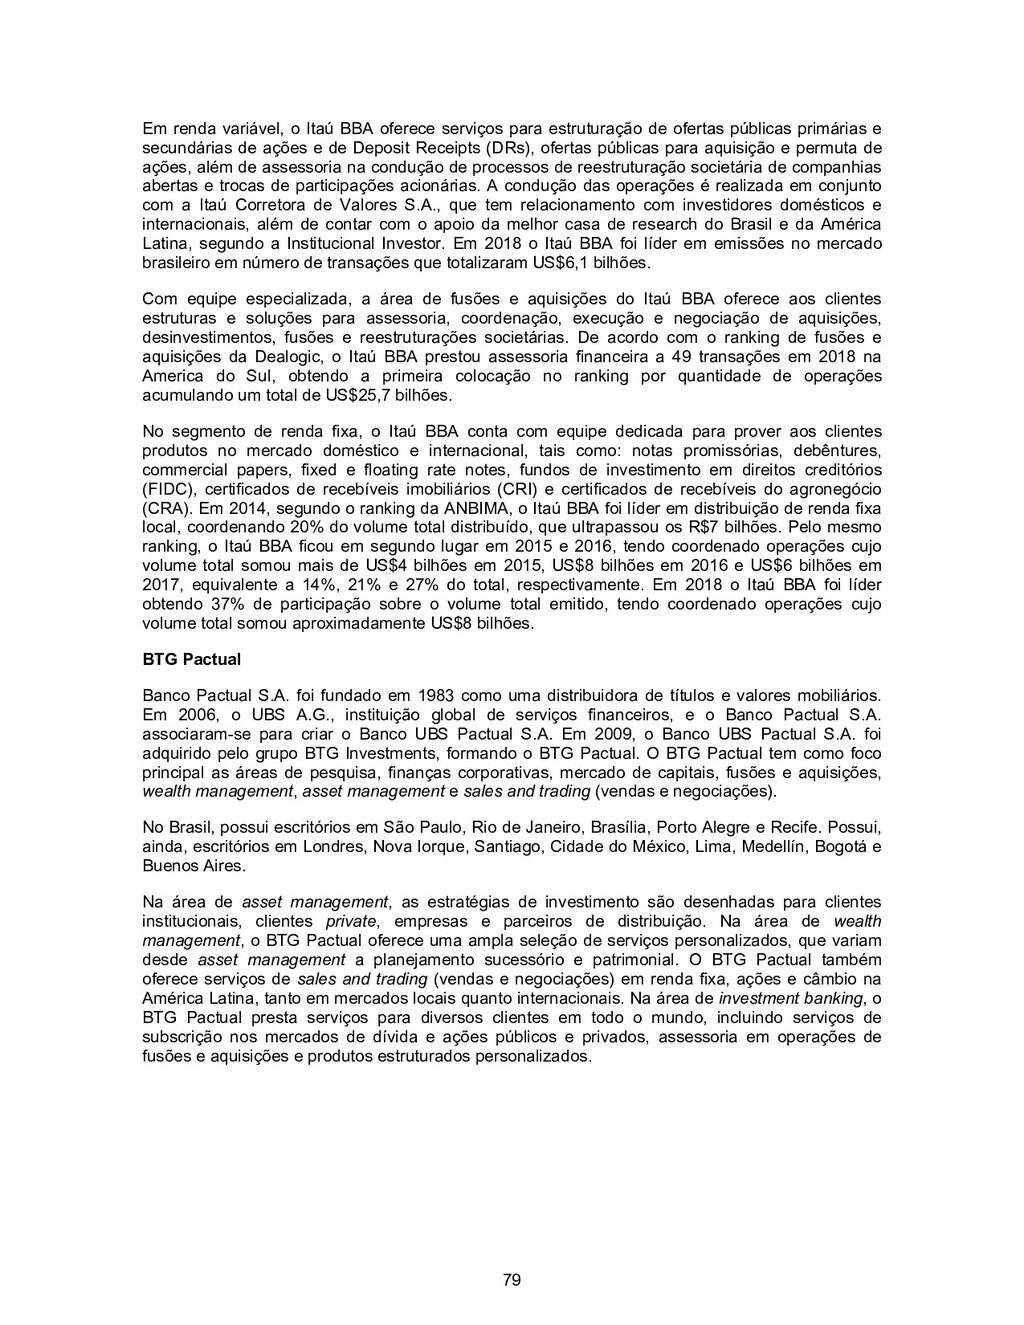 79 Em renda variável, o Itaú BBA oferece serviç...